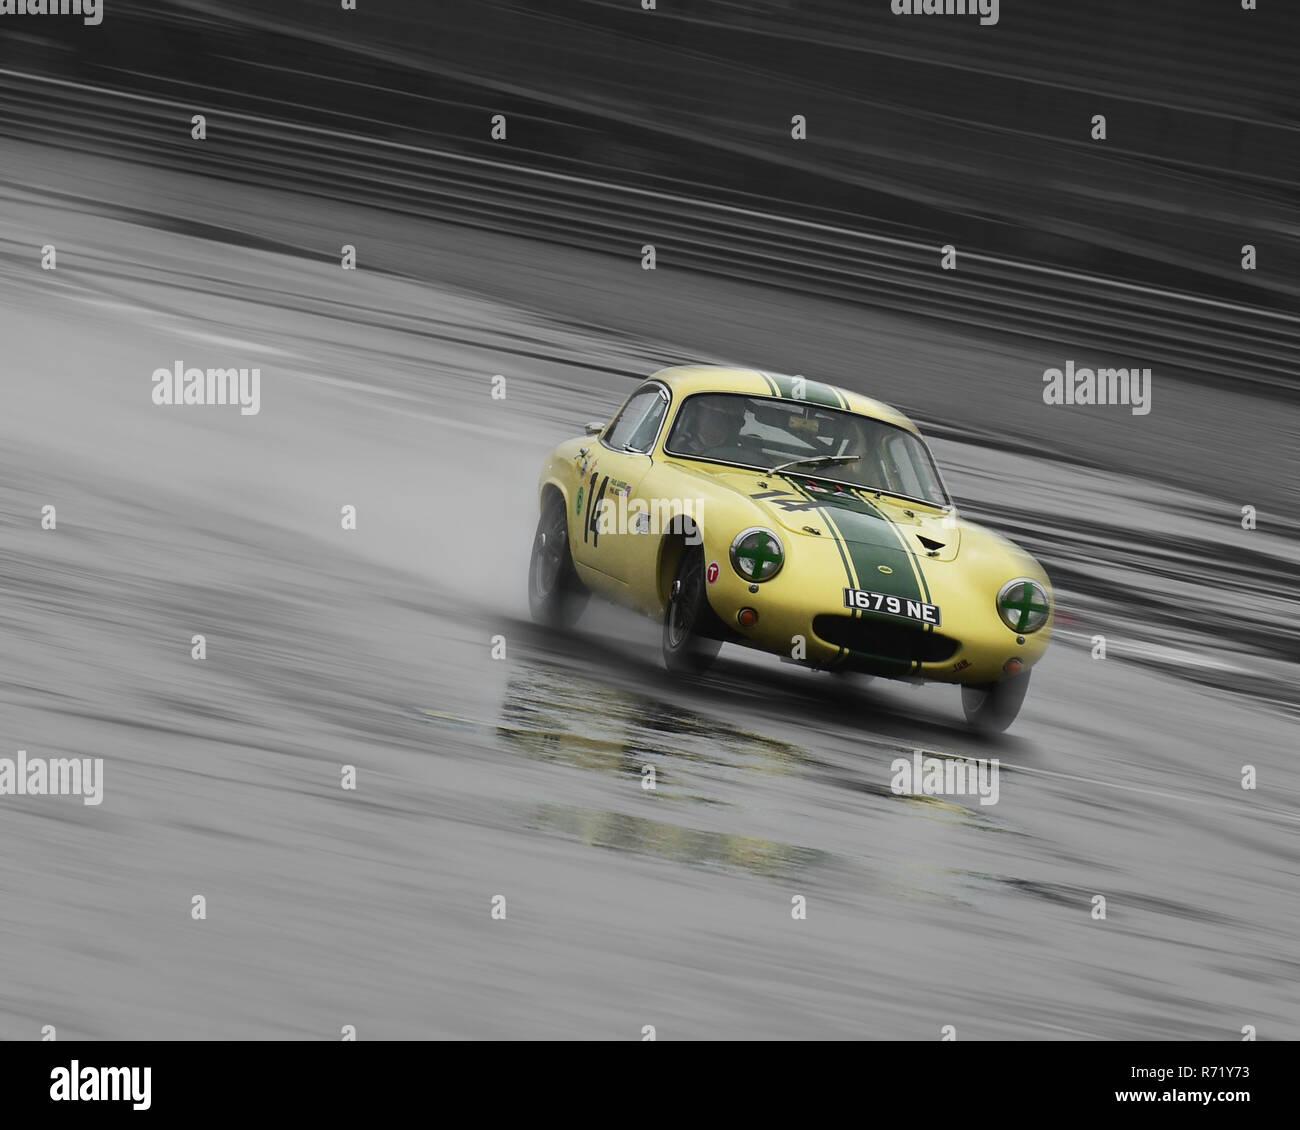 Paul Garside, Lotus Elite, 1679 NE, RAC Tourist Trophy, Historic cars, Pre-63 GT, Silverstone Classic 2015, Chris McEvoy, circuit racing, cjm-photogra - Stock Image